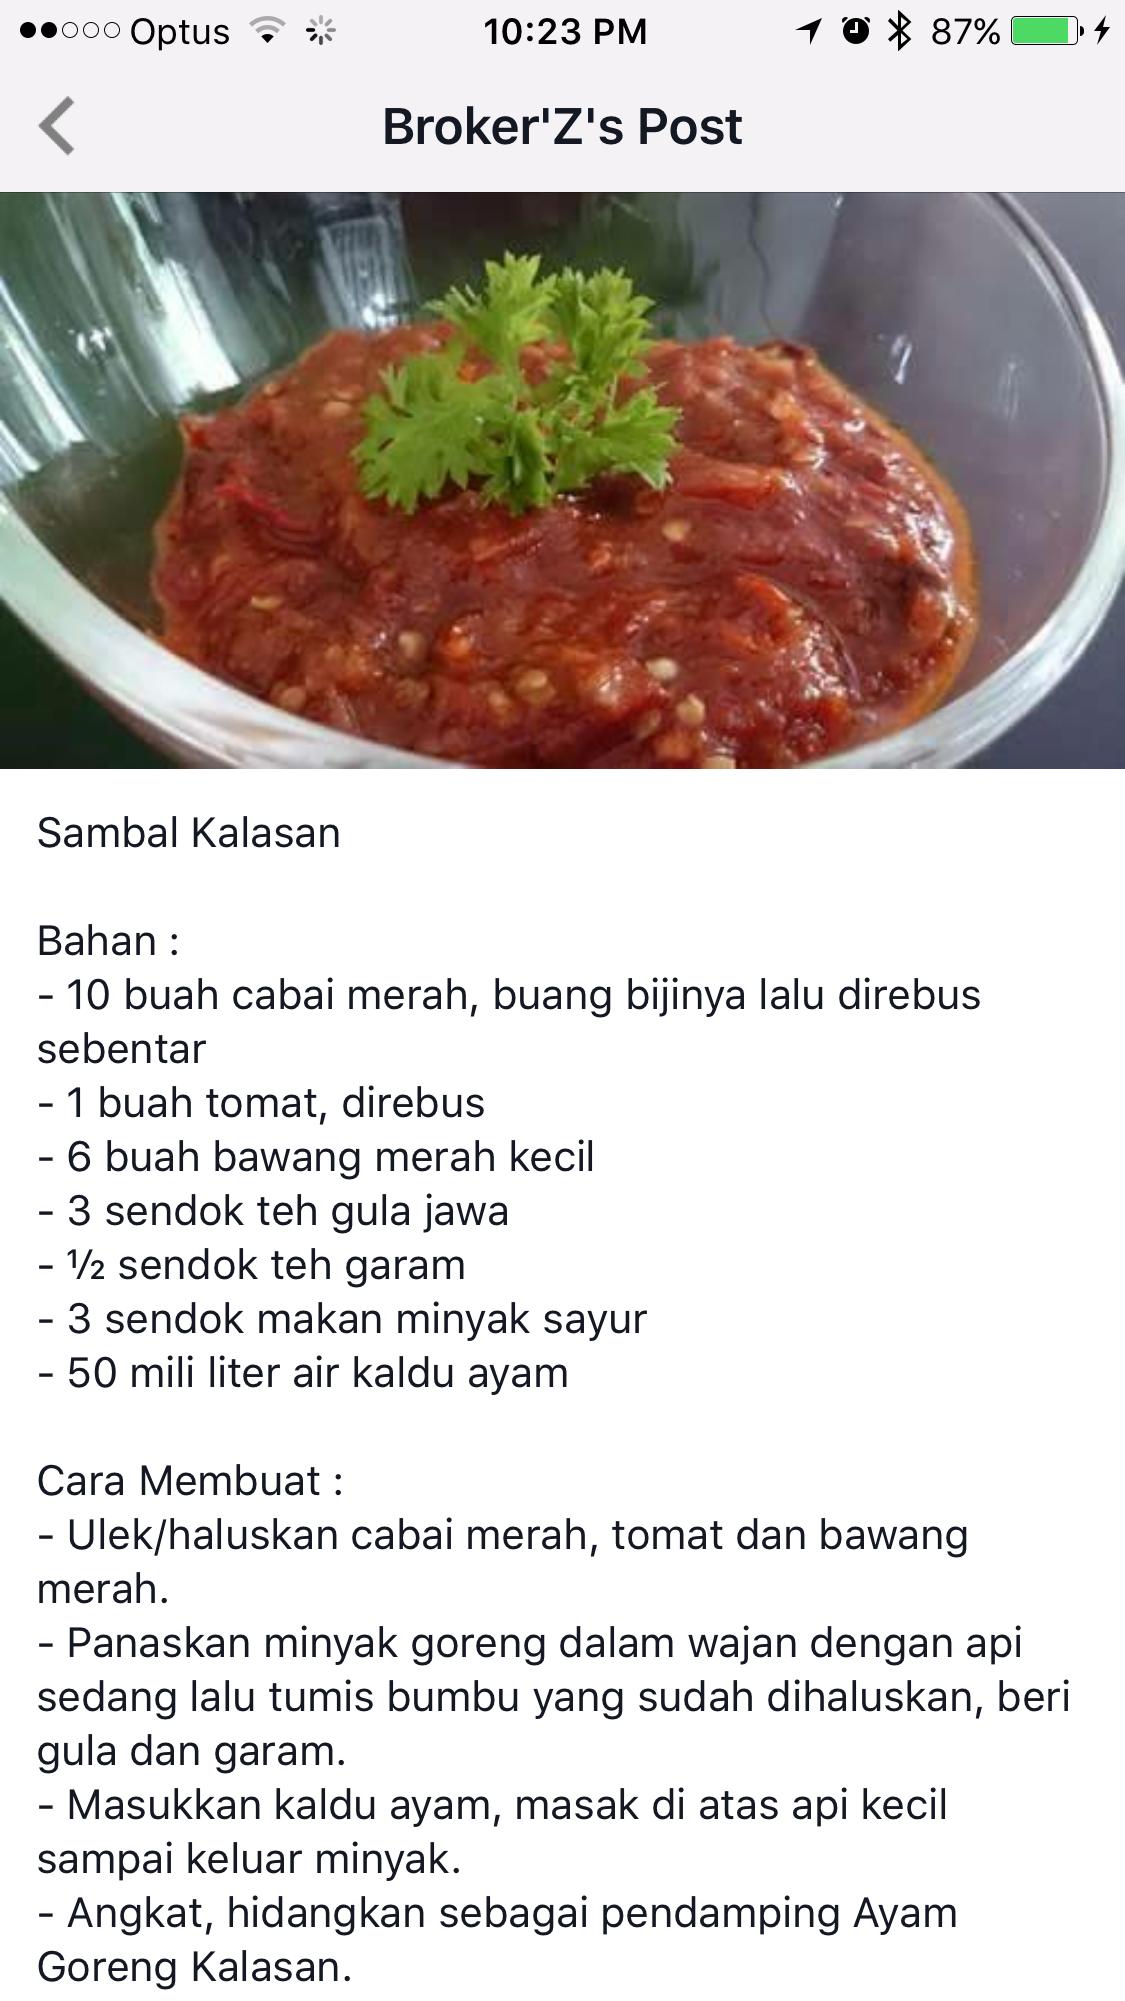 Pin Oleh Cisca Kosuma Di Resep Aneka Sambal Resep Masakan Makanan Dan Minuman Masakan Indonesia